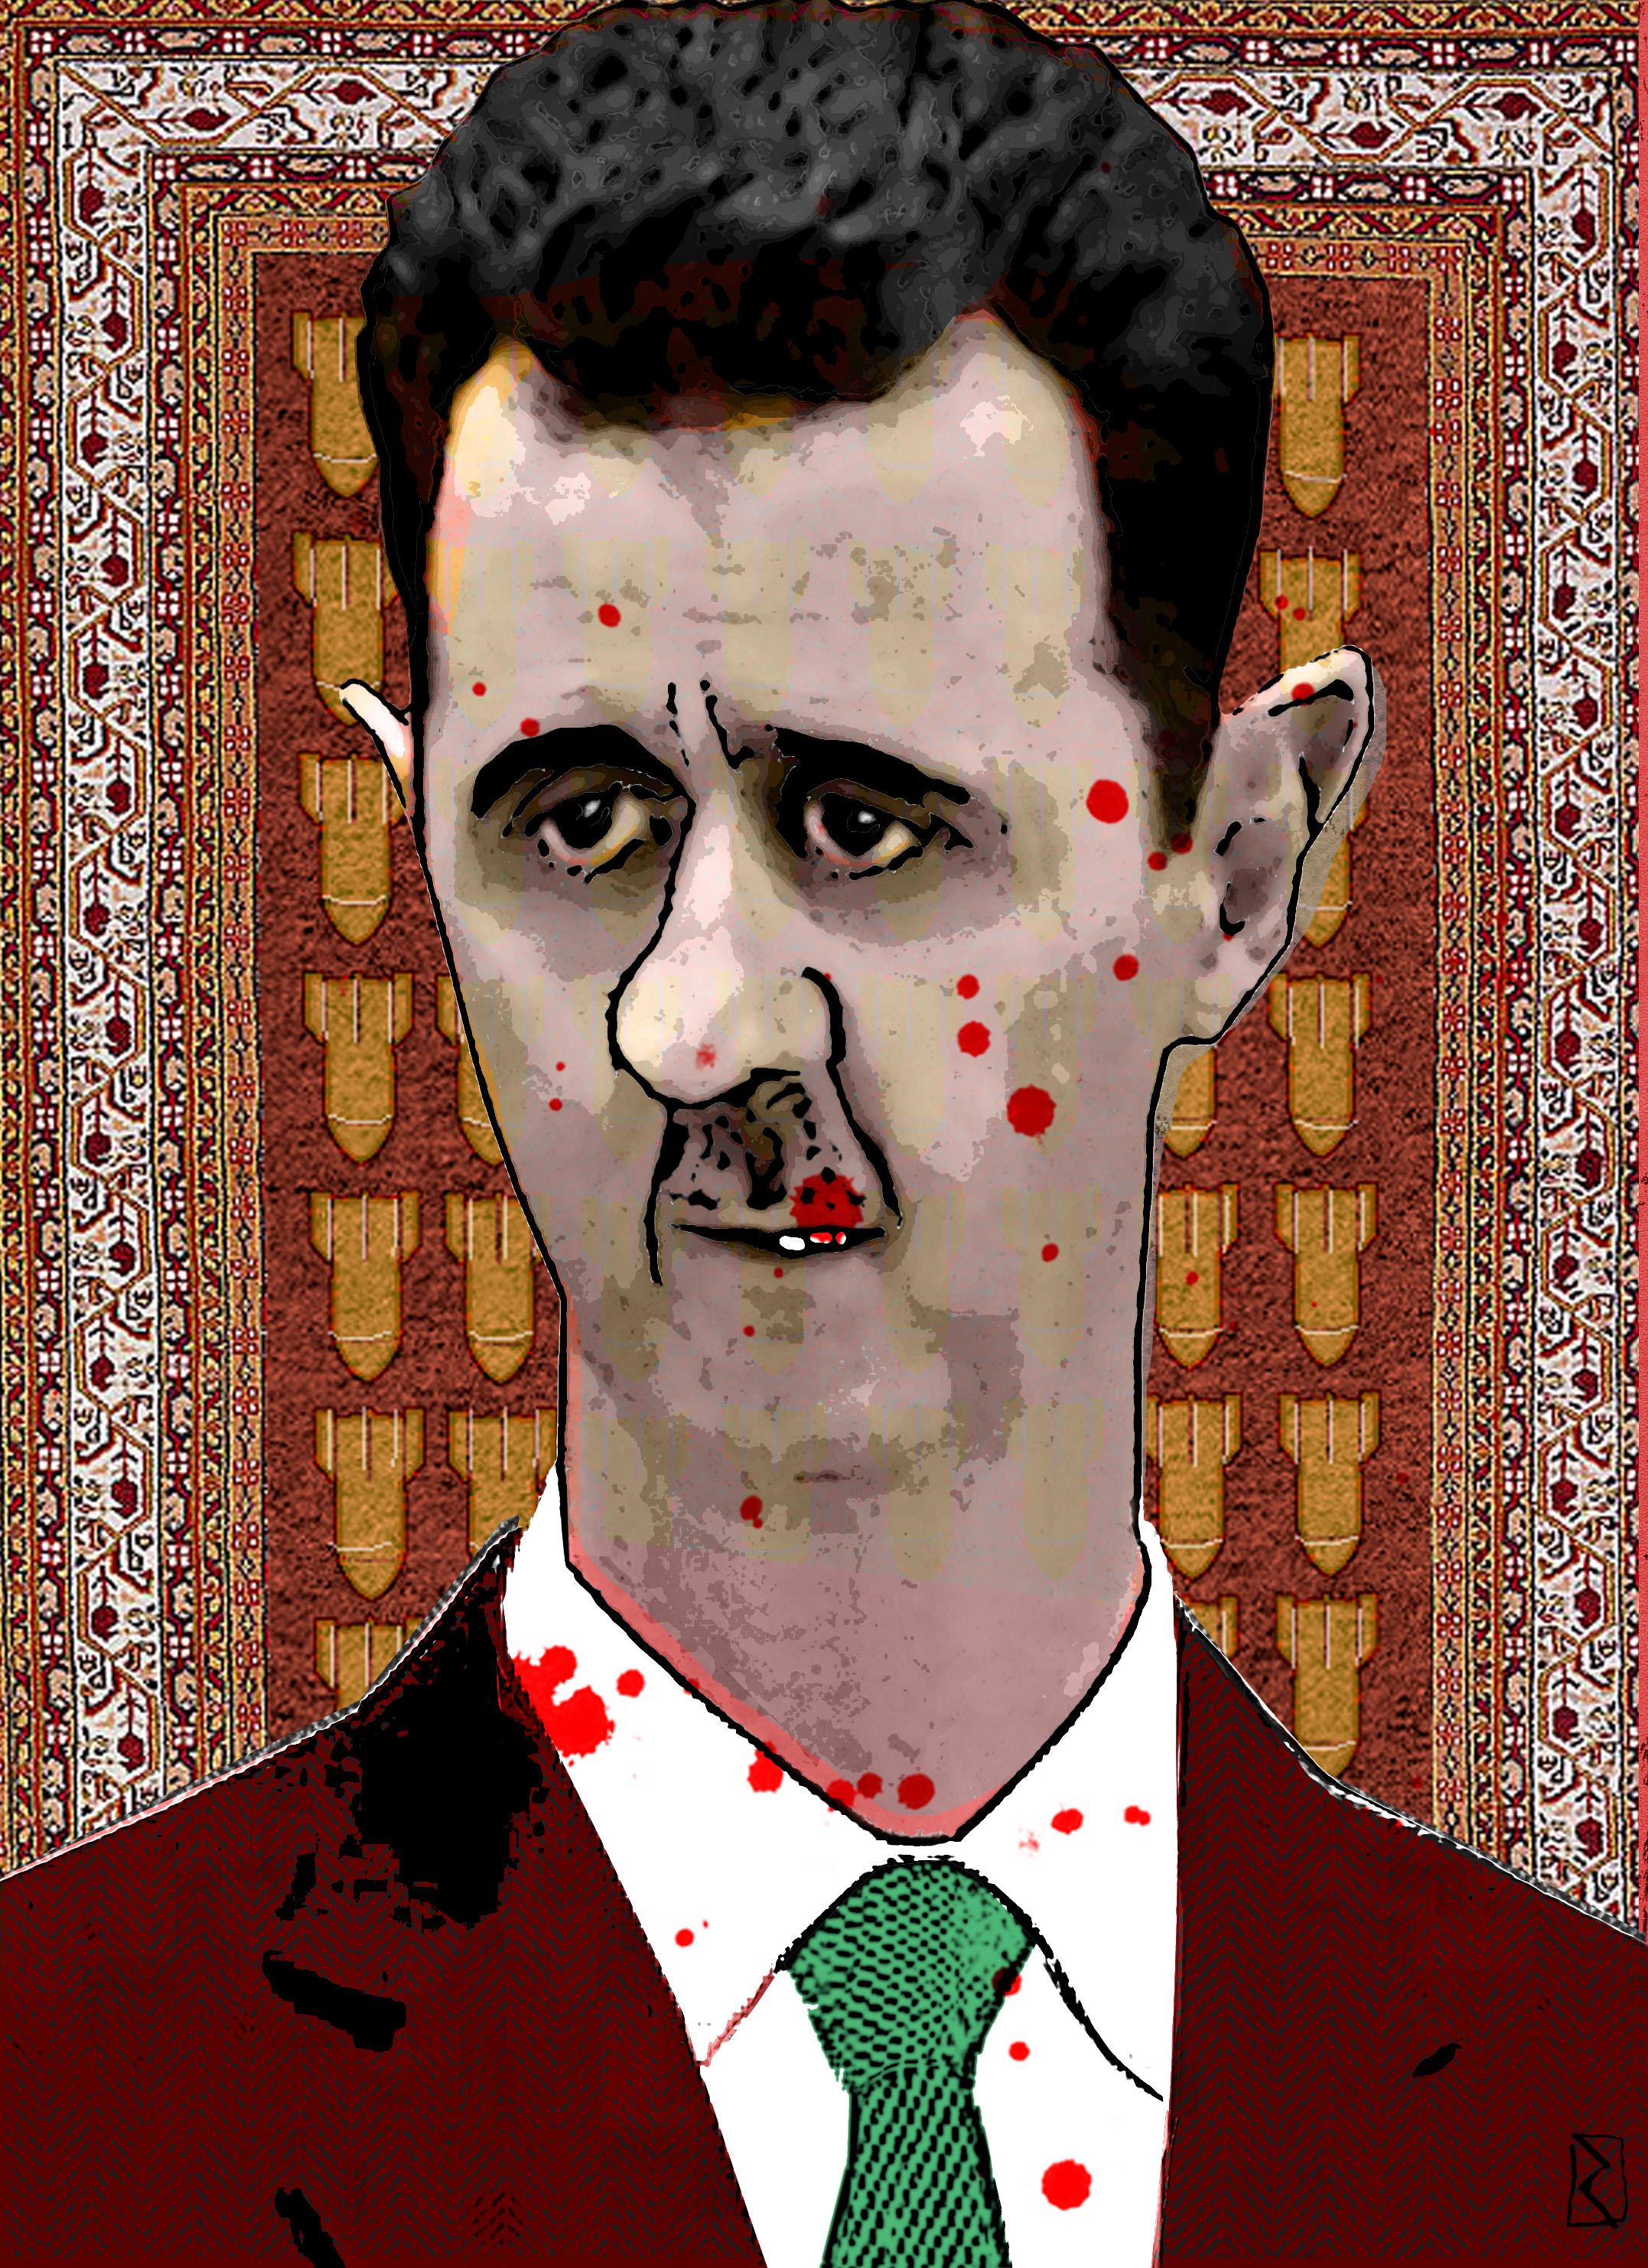 Teppich_Al-Assad